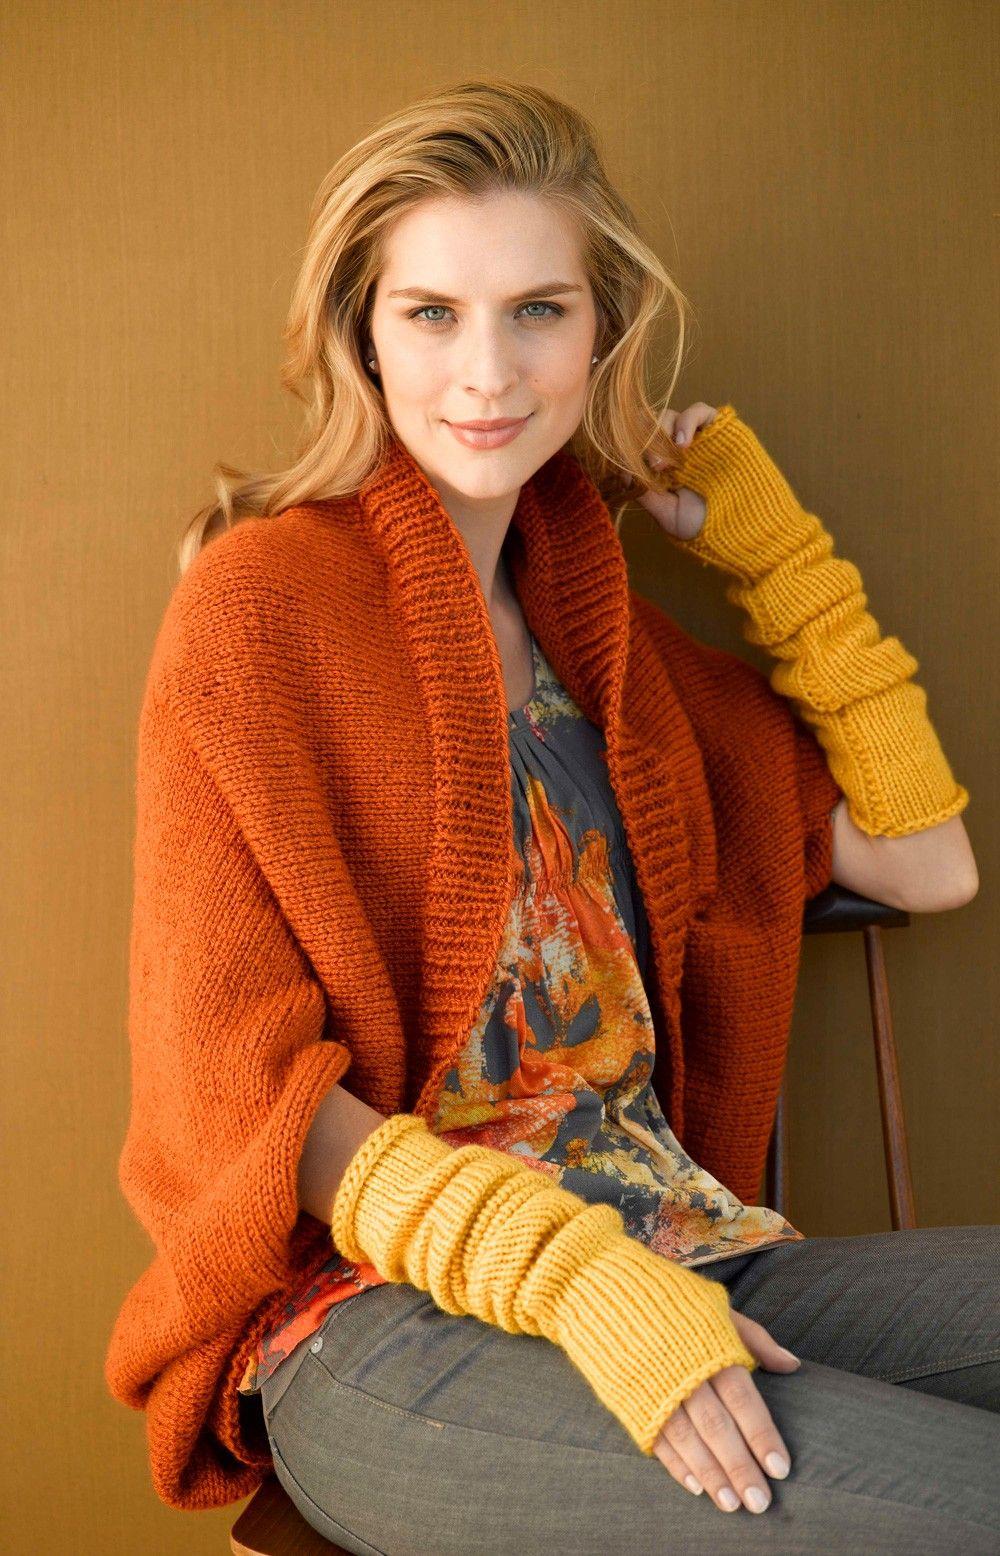 Harvest Shrug Pattern (Knit) - Patterns - Lion Brand Yarn ...